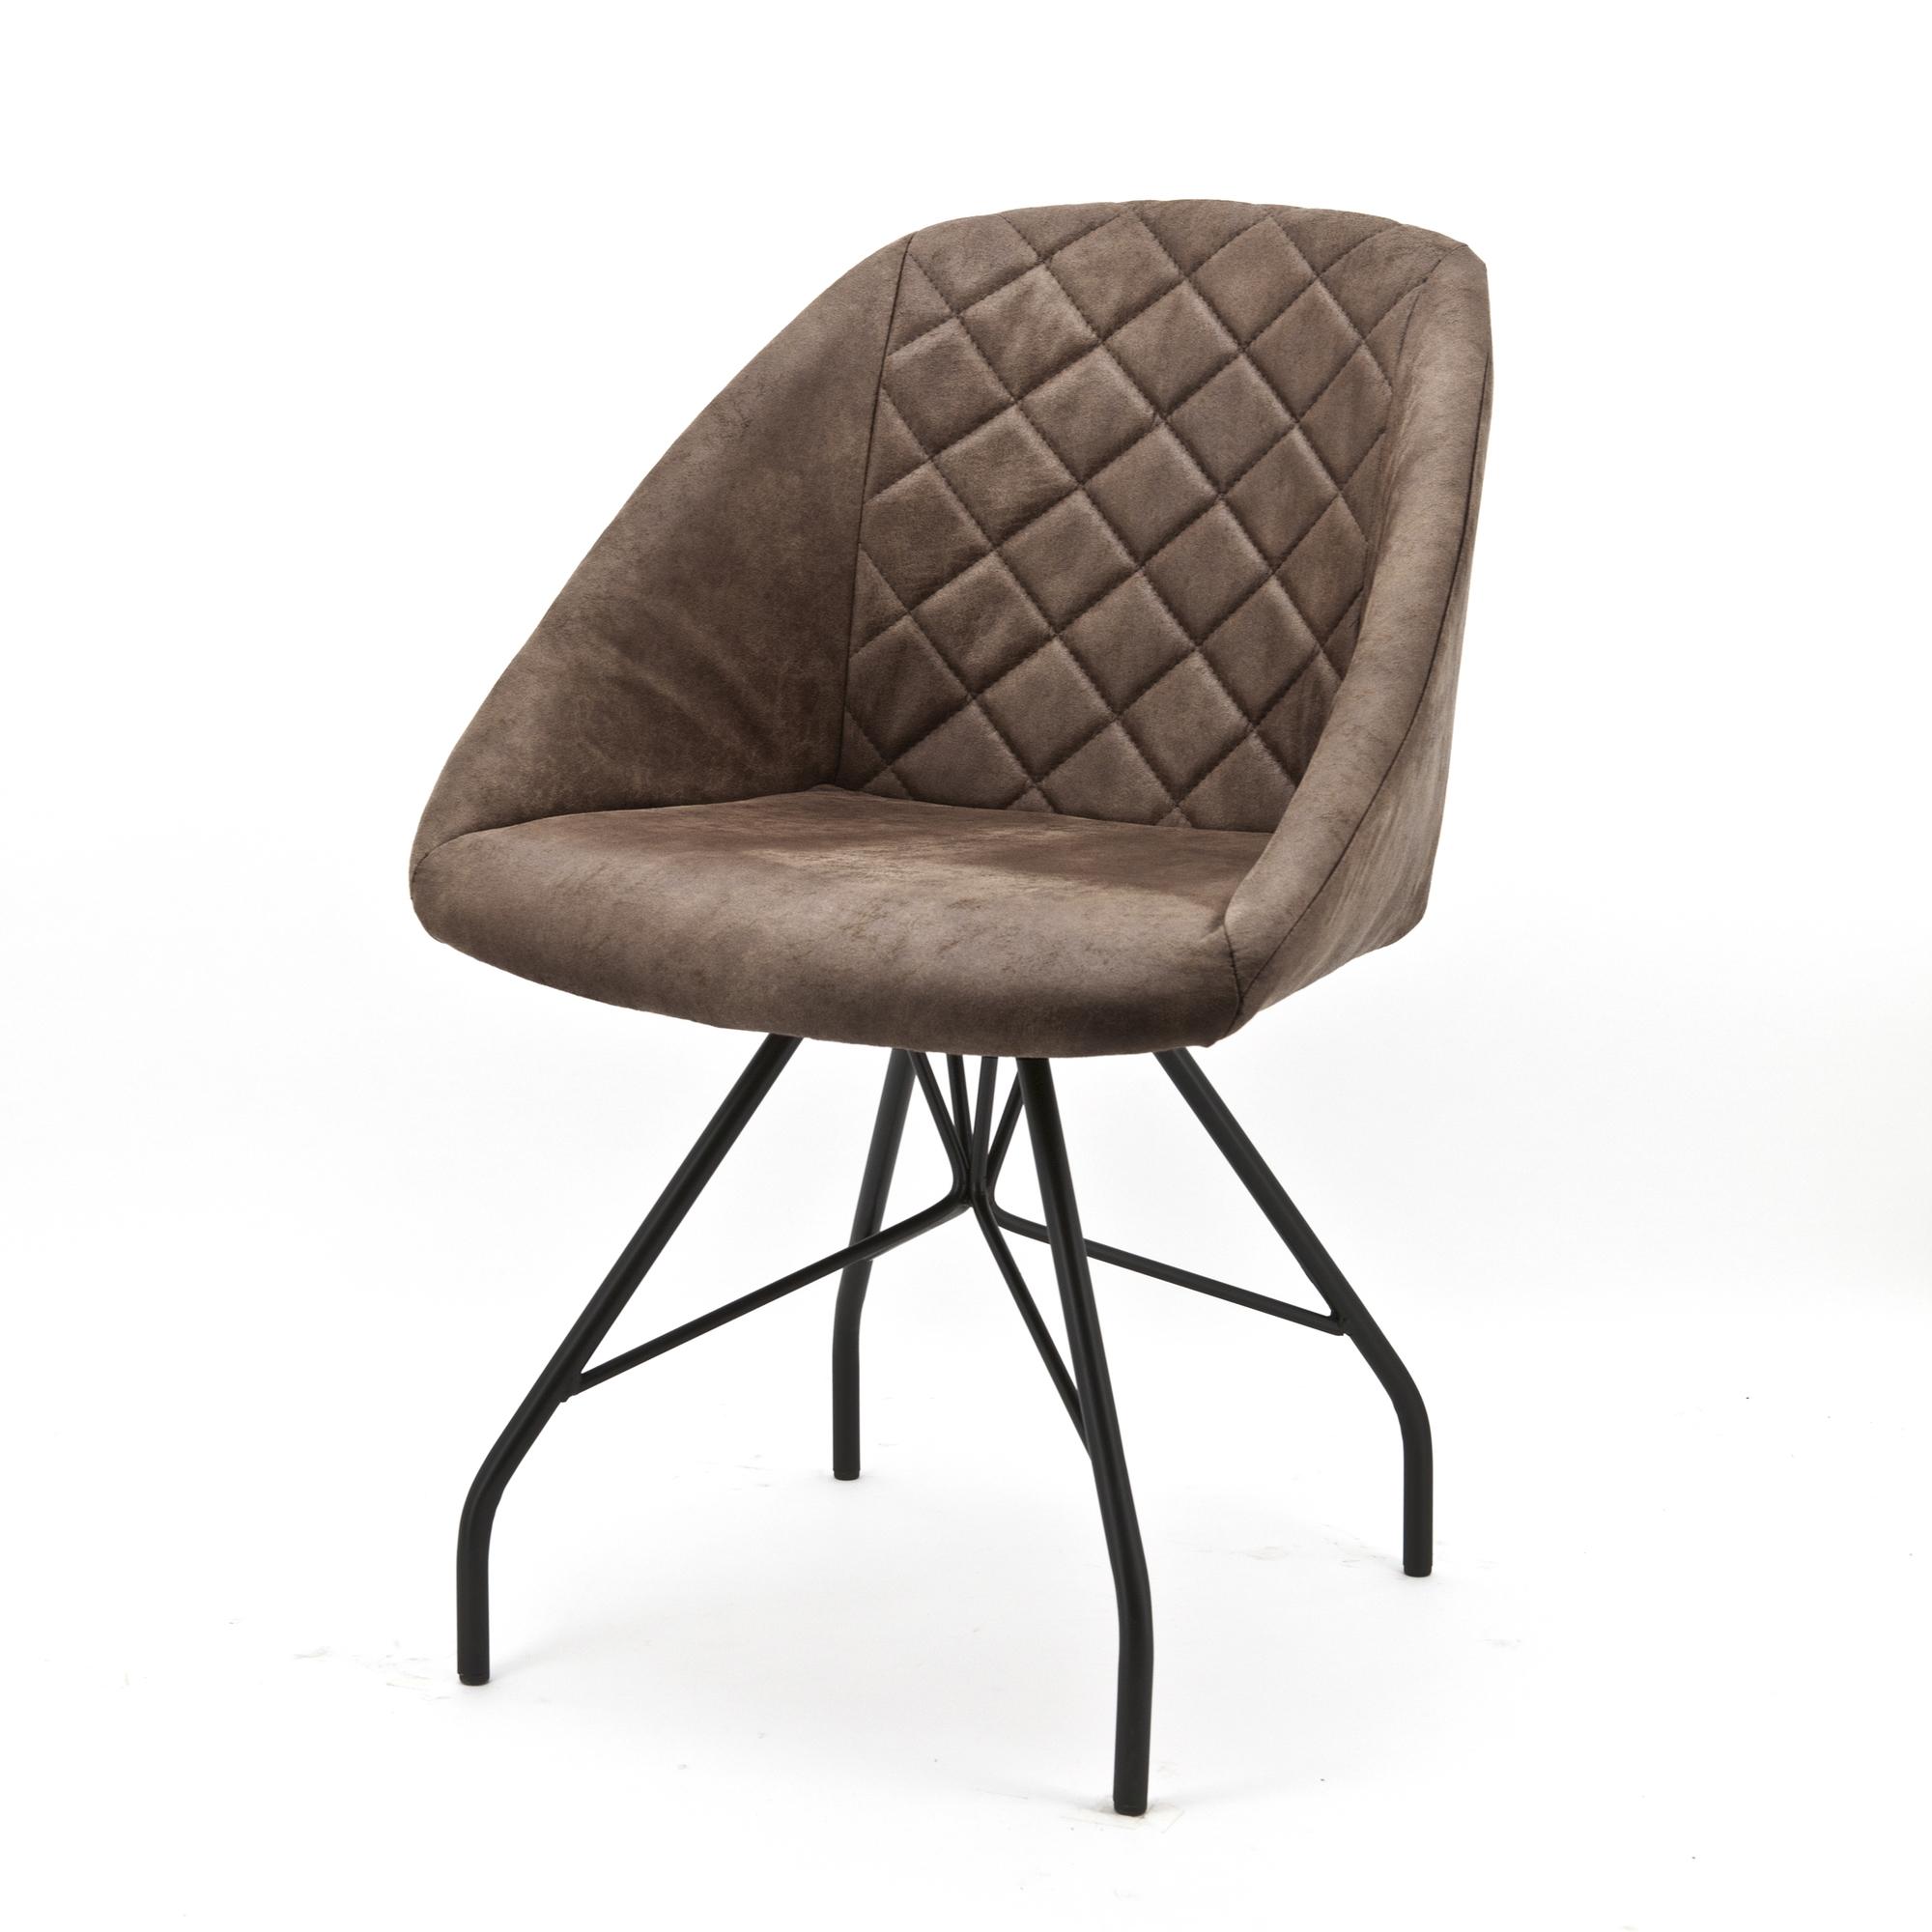 stoel-tone-metalenpoot-eleonora-90161-bruin